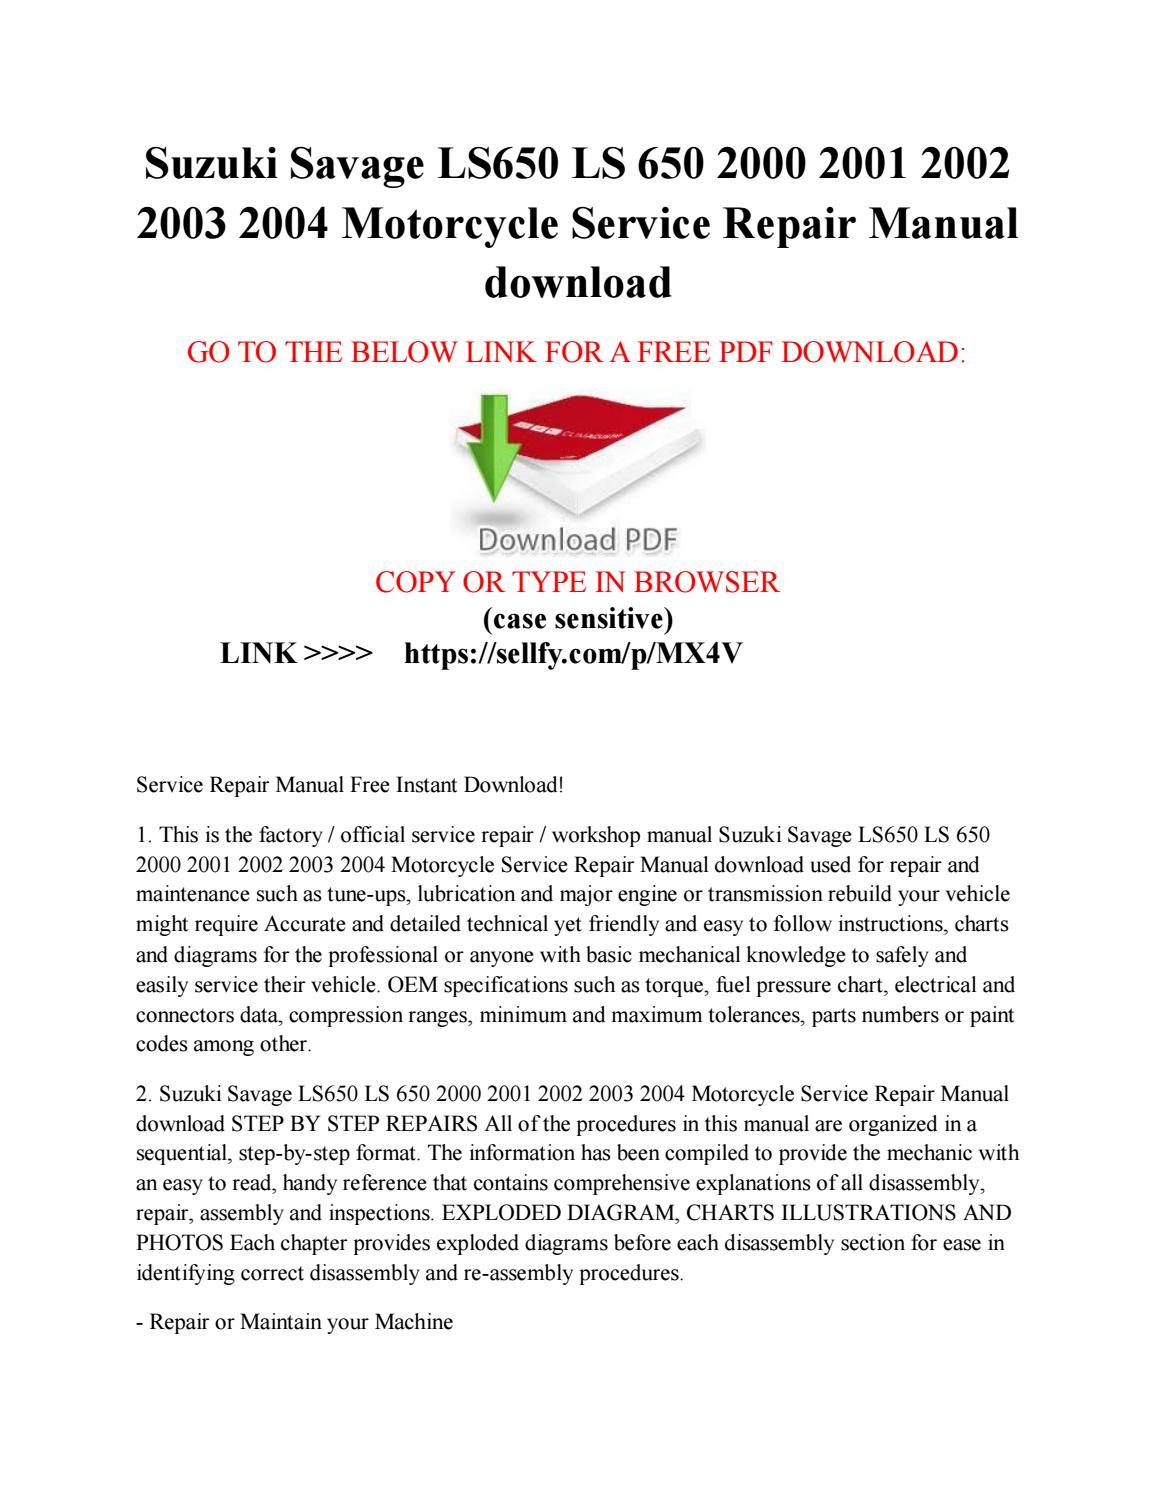 Suzuki savage ls650 ls 650 2000 2001 2002 2003 2004 motorcycle service  repair manual free download by JIM - issuu